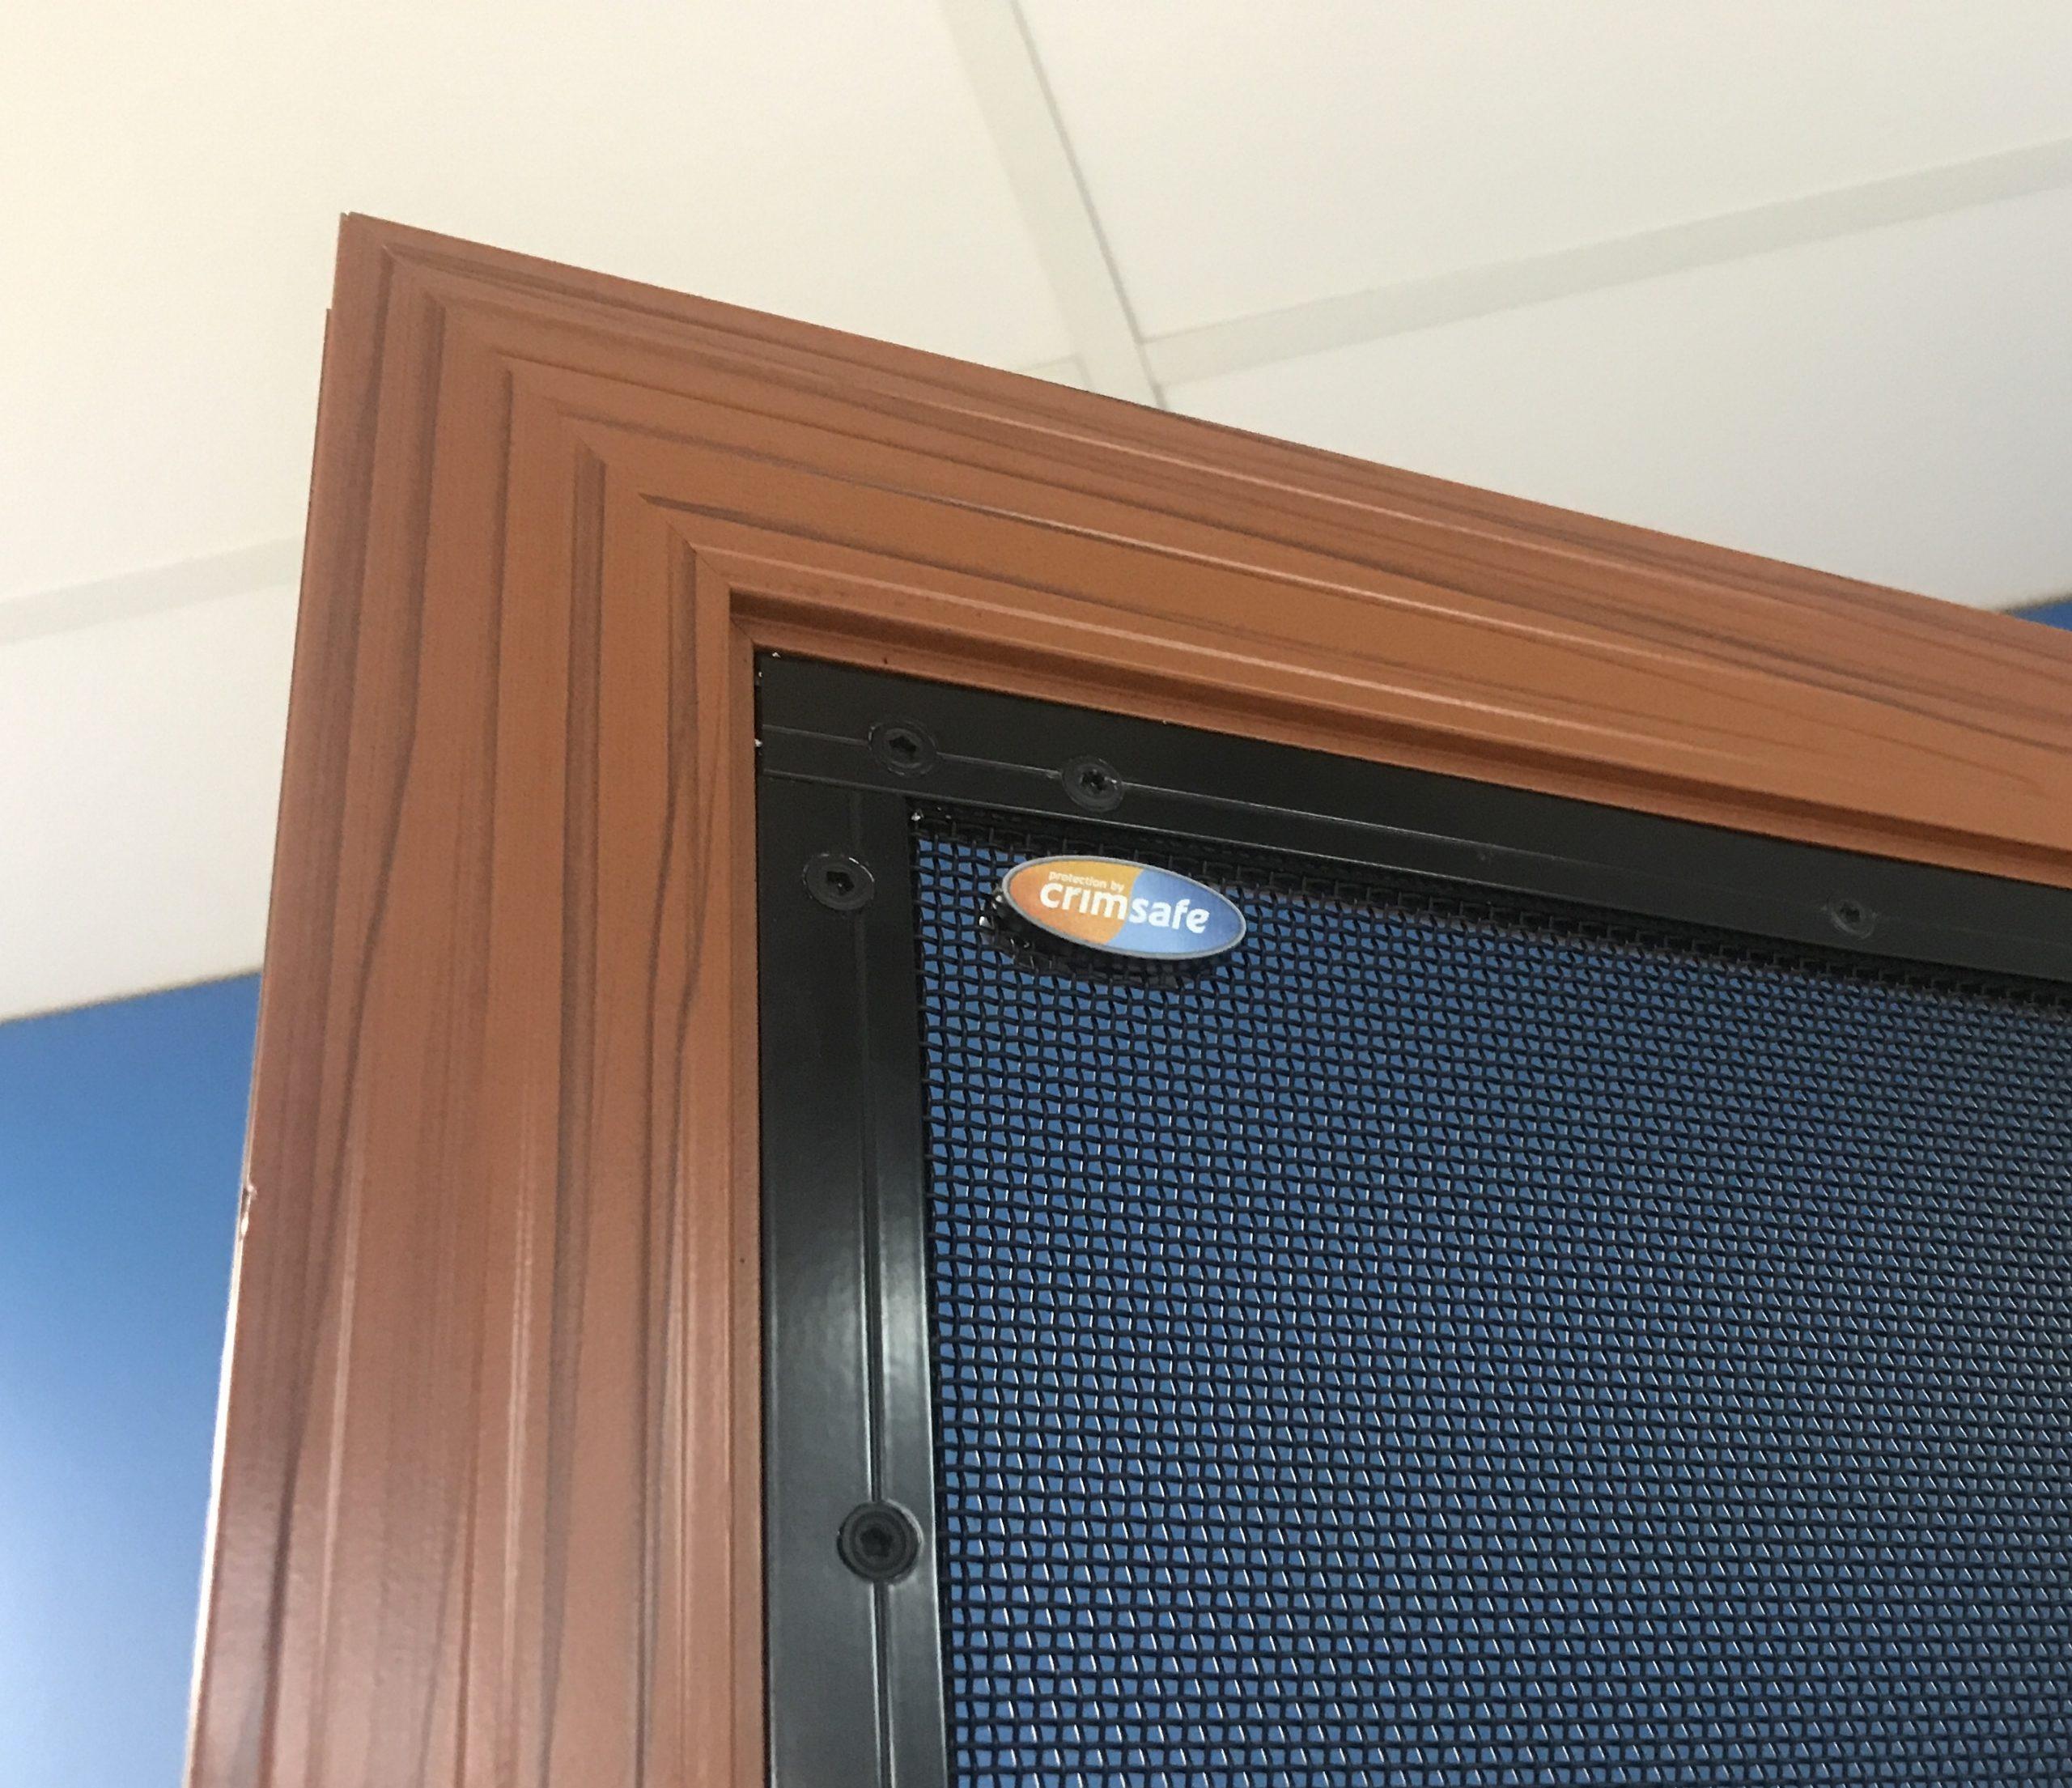 Crimsafe standard doors on sale at zeee.com.au